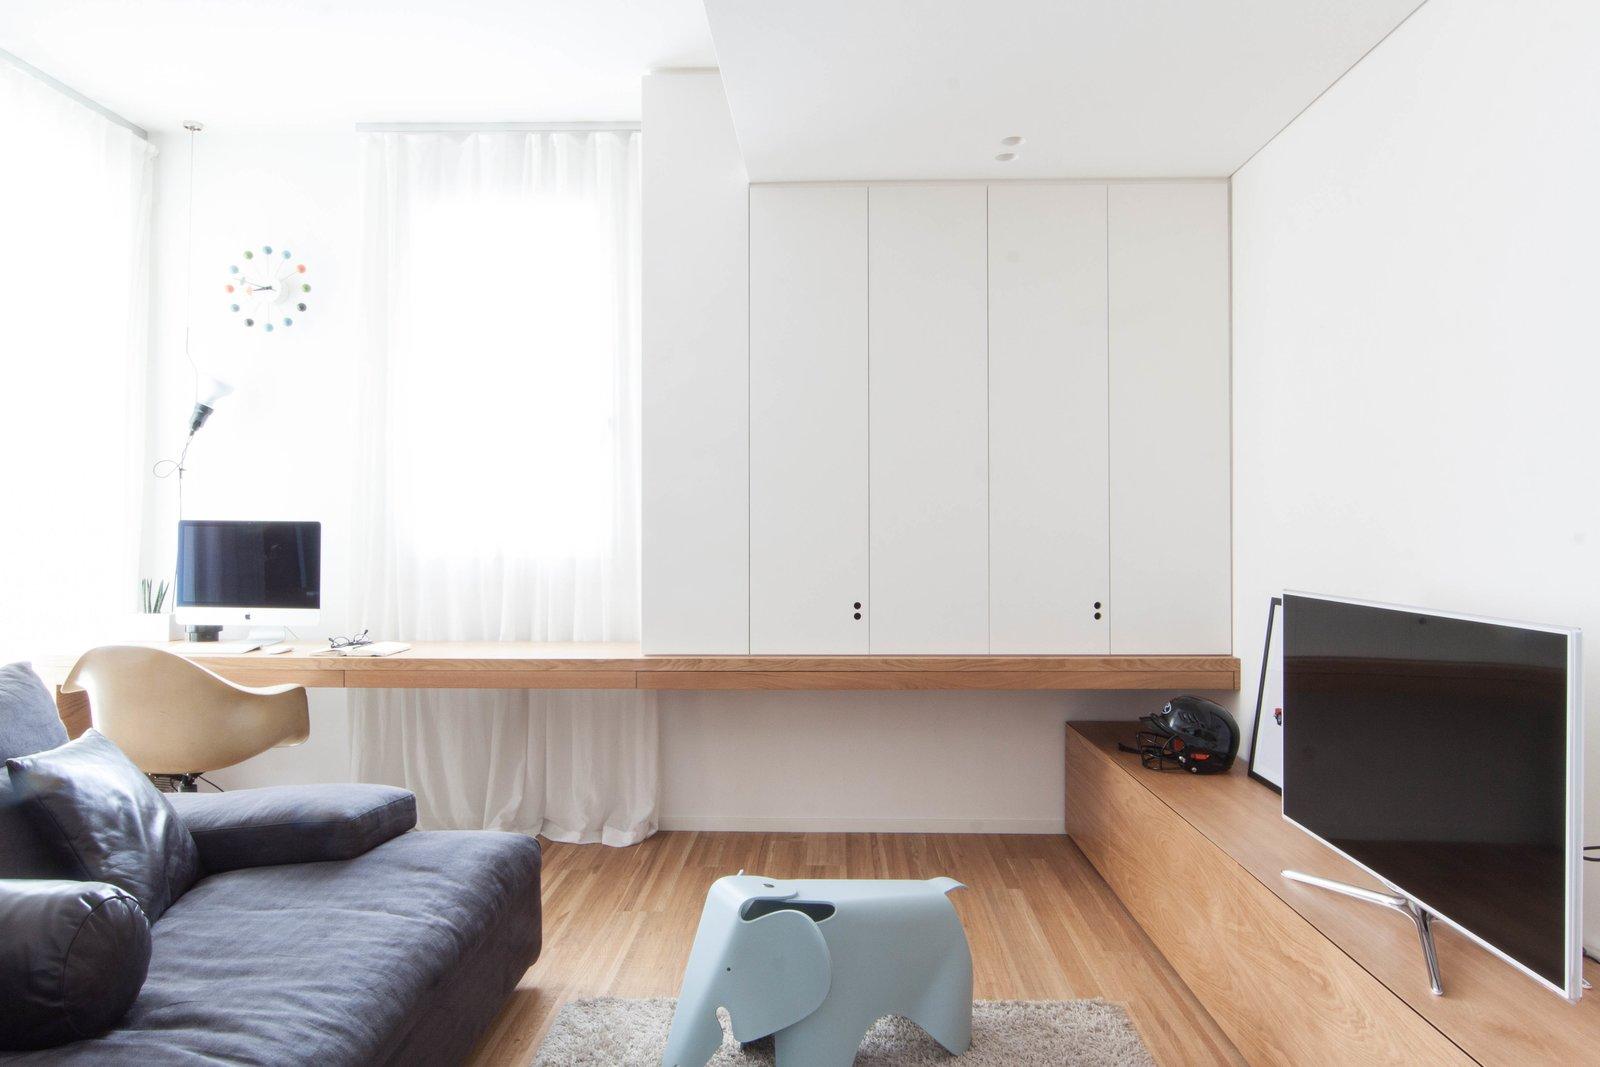 Living Room, Chair, Sofa, Desk, Lamps, Ceiling Lighting, Floor Lighting, Pendant Lighting, and Medium Hardwood Floor  Interior LP by Didonè Comacchio